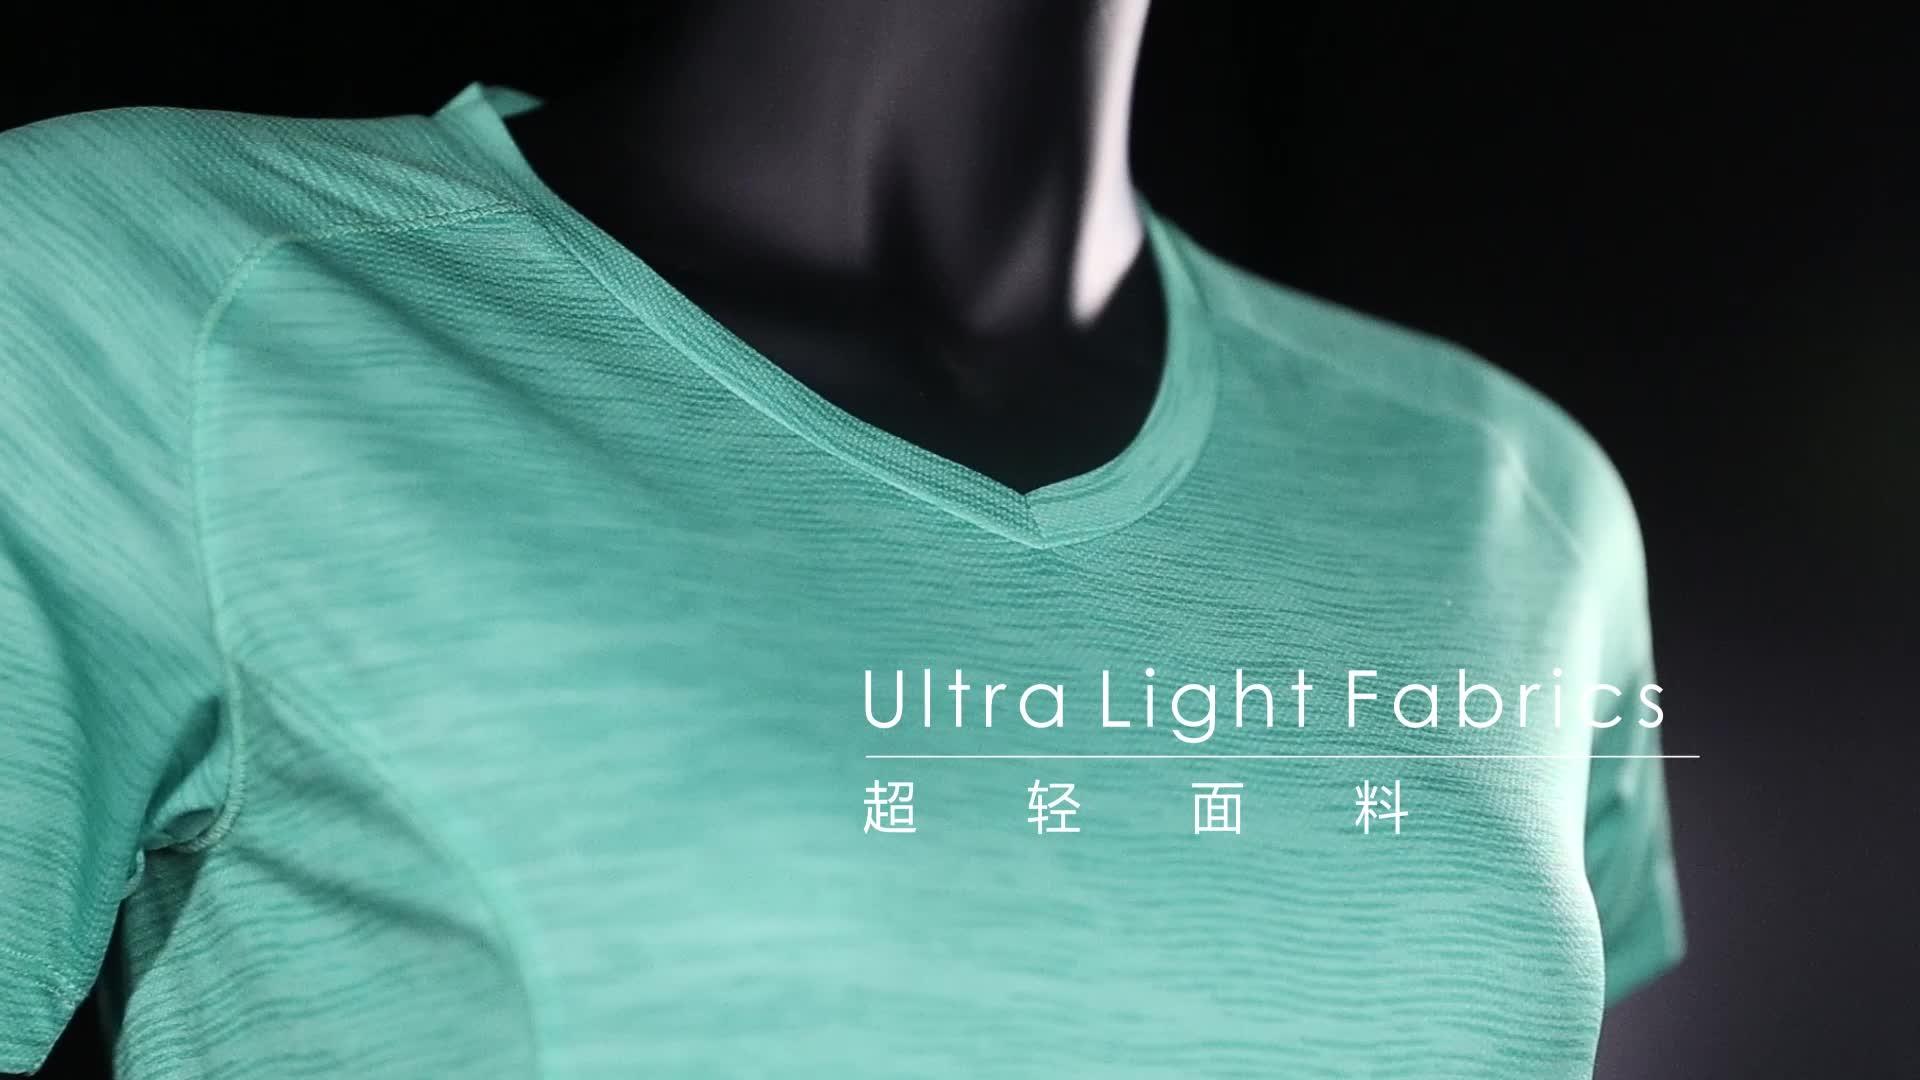 2018 Women T Shirt Quick-drying Fitness Clothes Running Gym Yoga Shirts